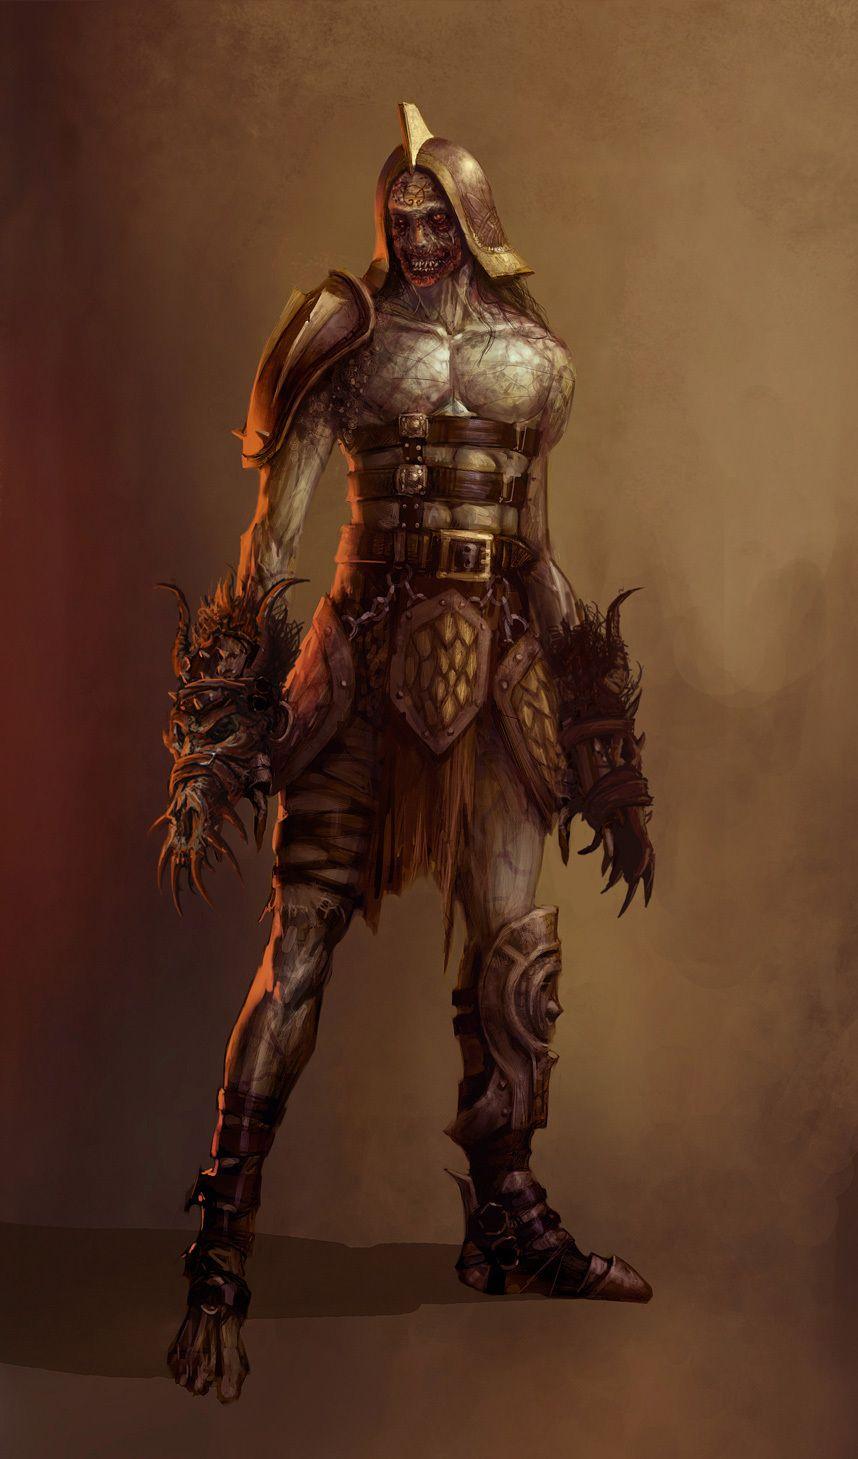 Devouring-Corpse-Concept-Art-dragon-age-origins-17321835-858-1459.jpg (858×1459)